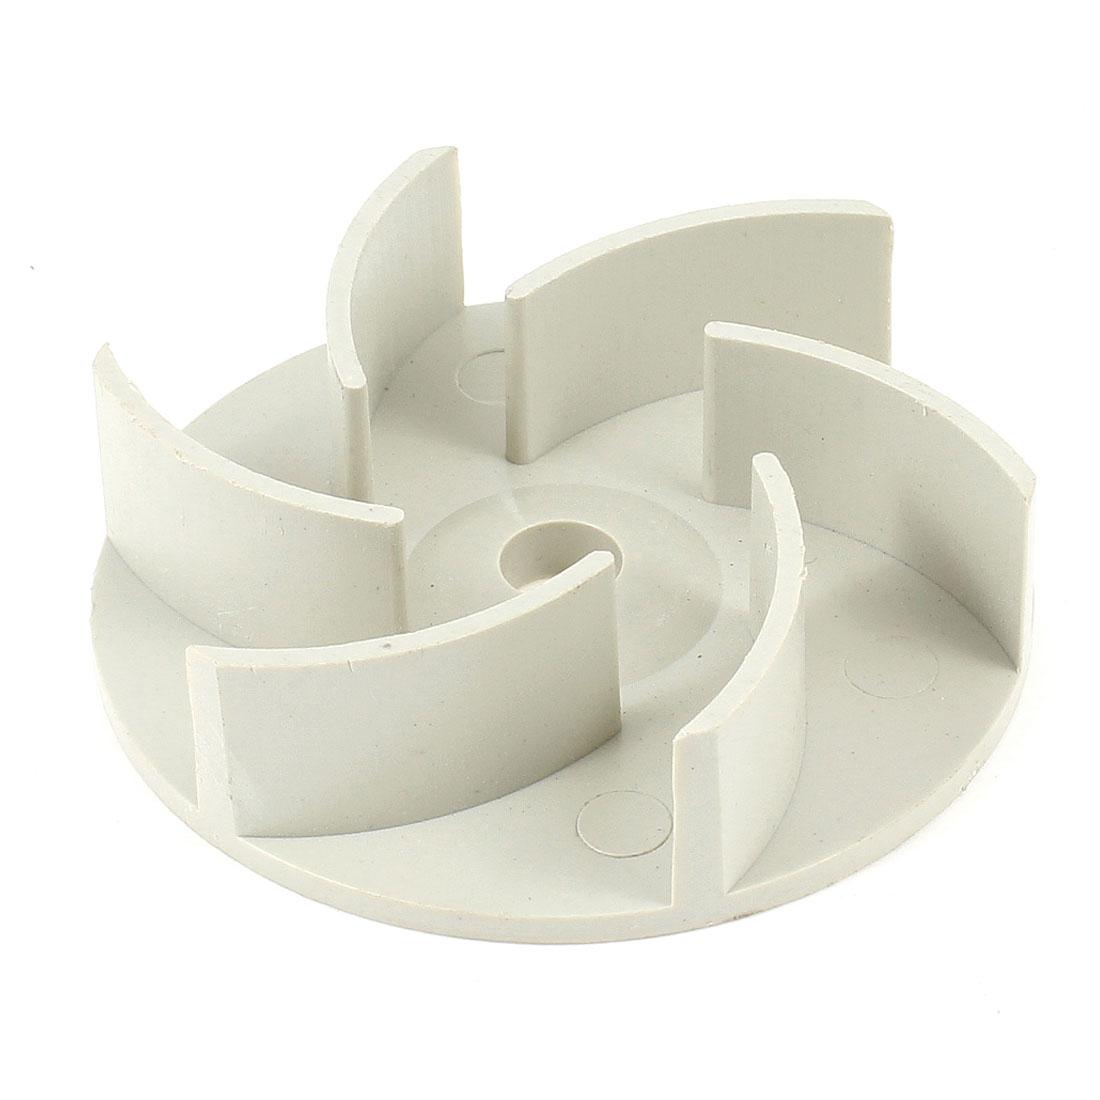 Light Gray Plastic 94mm Outside Dia. 6 Vanes Fuel Pump Impeller